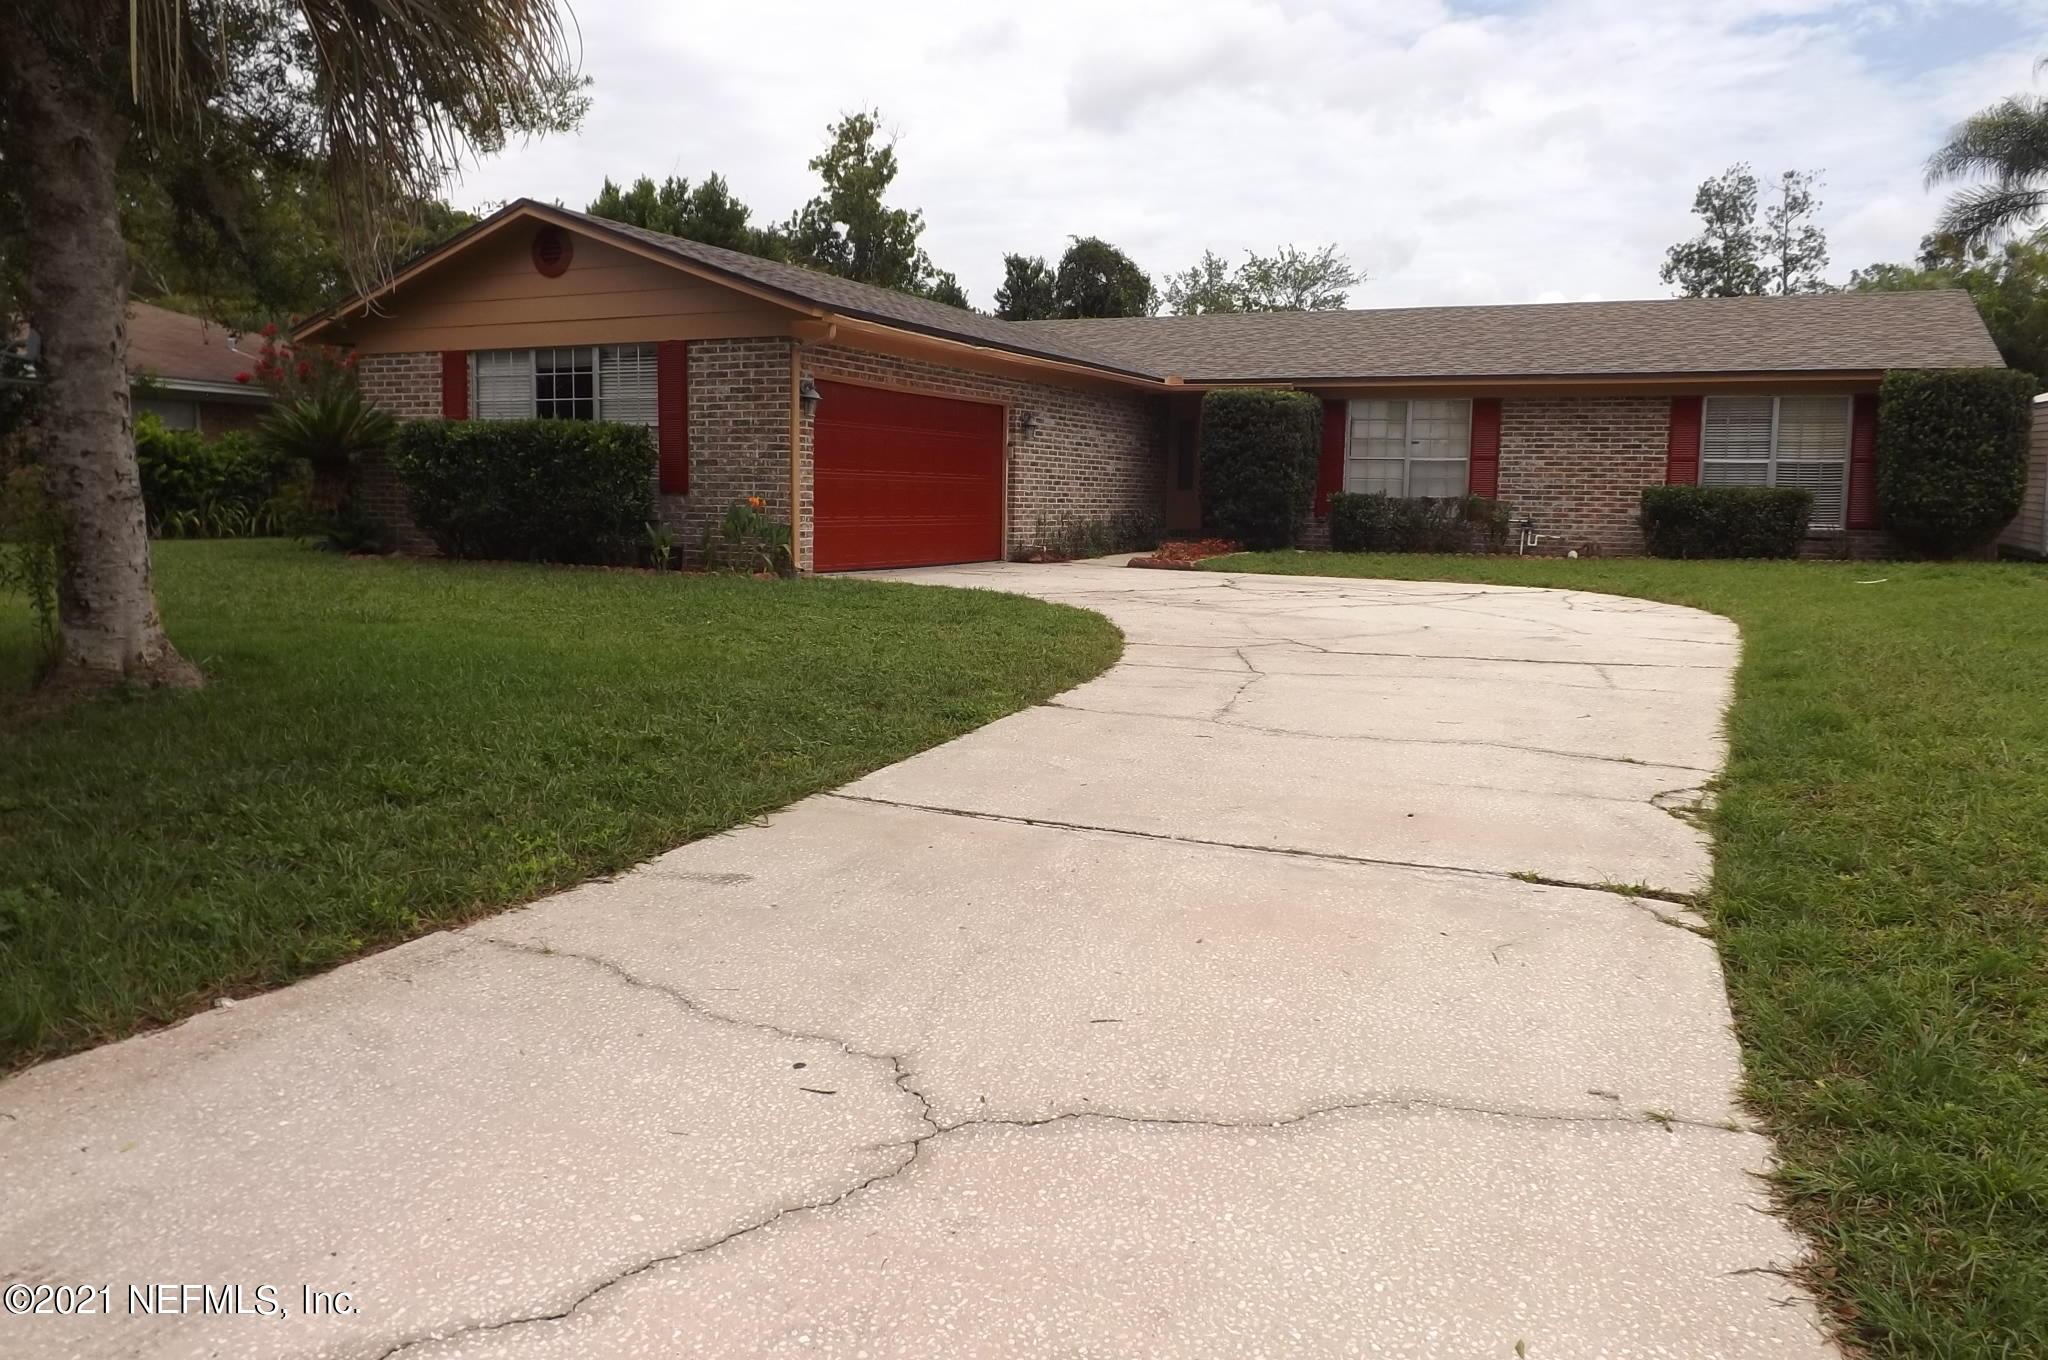 571 CODY, ORANGE PARK, FLORIDA 32073, 3 Bedrooms Bedrooms, ,2 BathroomsBathrooms,Residential,For sale,CODY,1124651